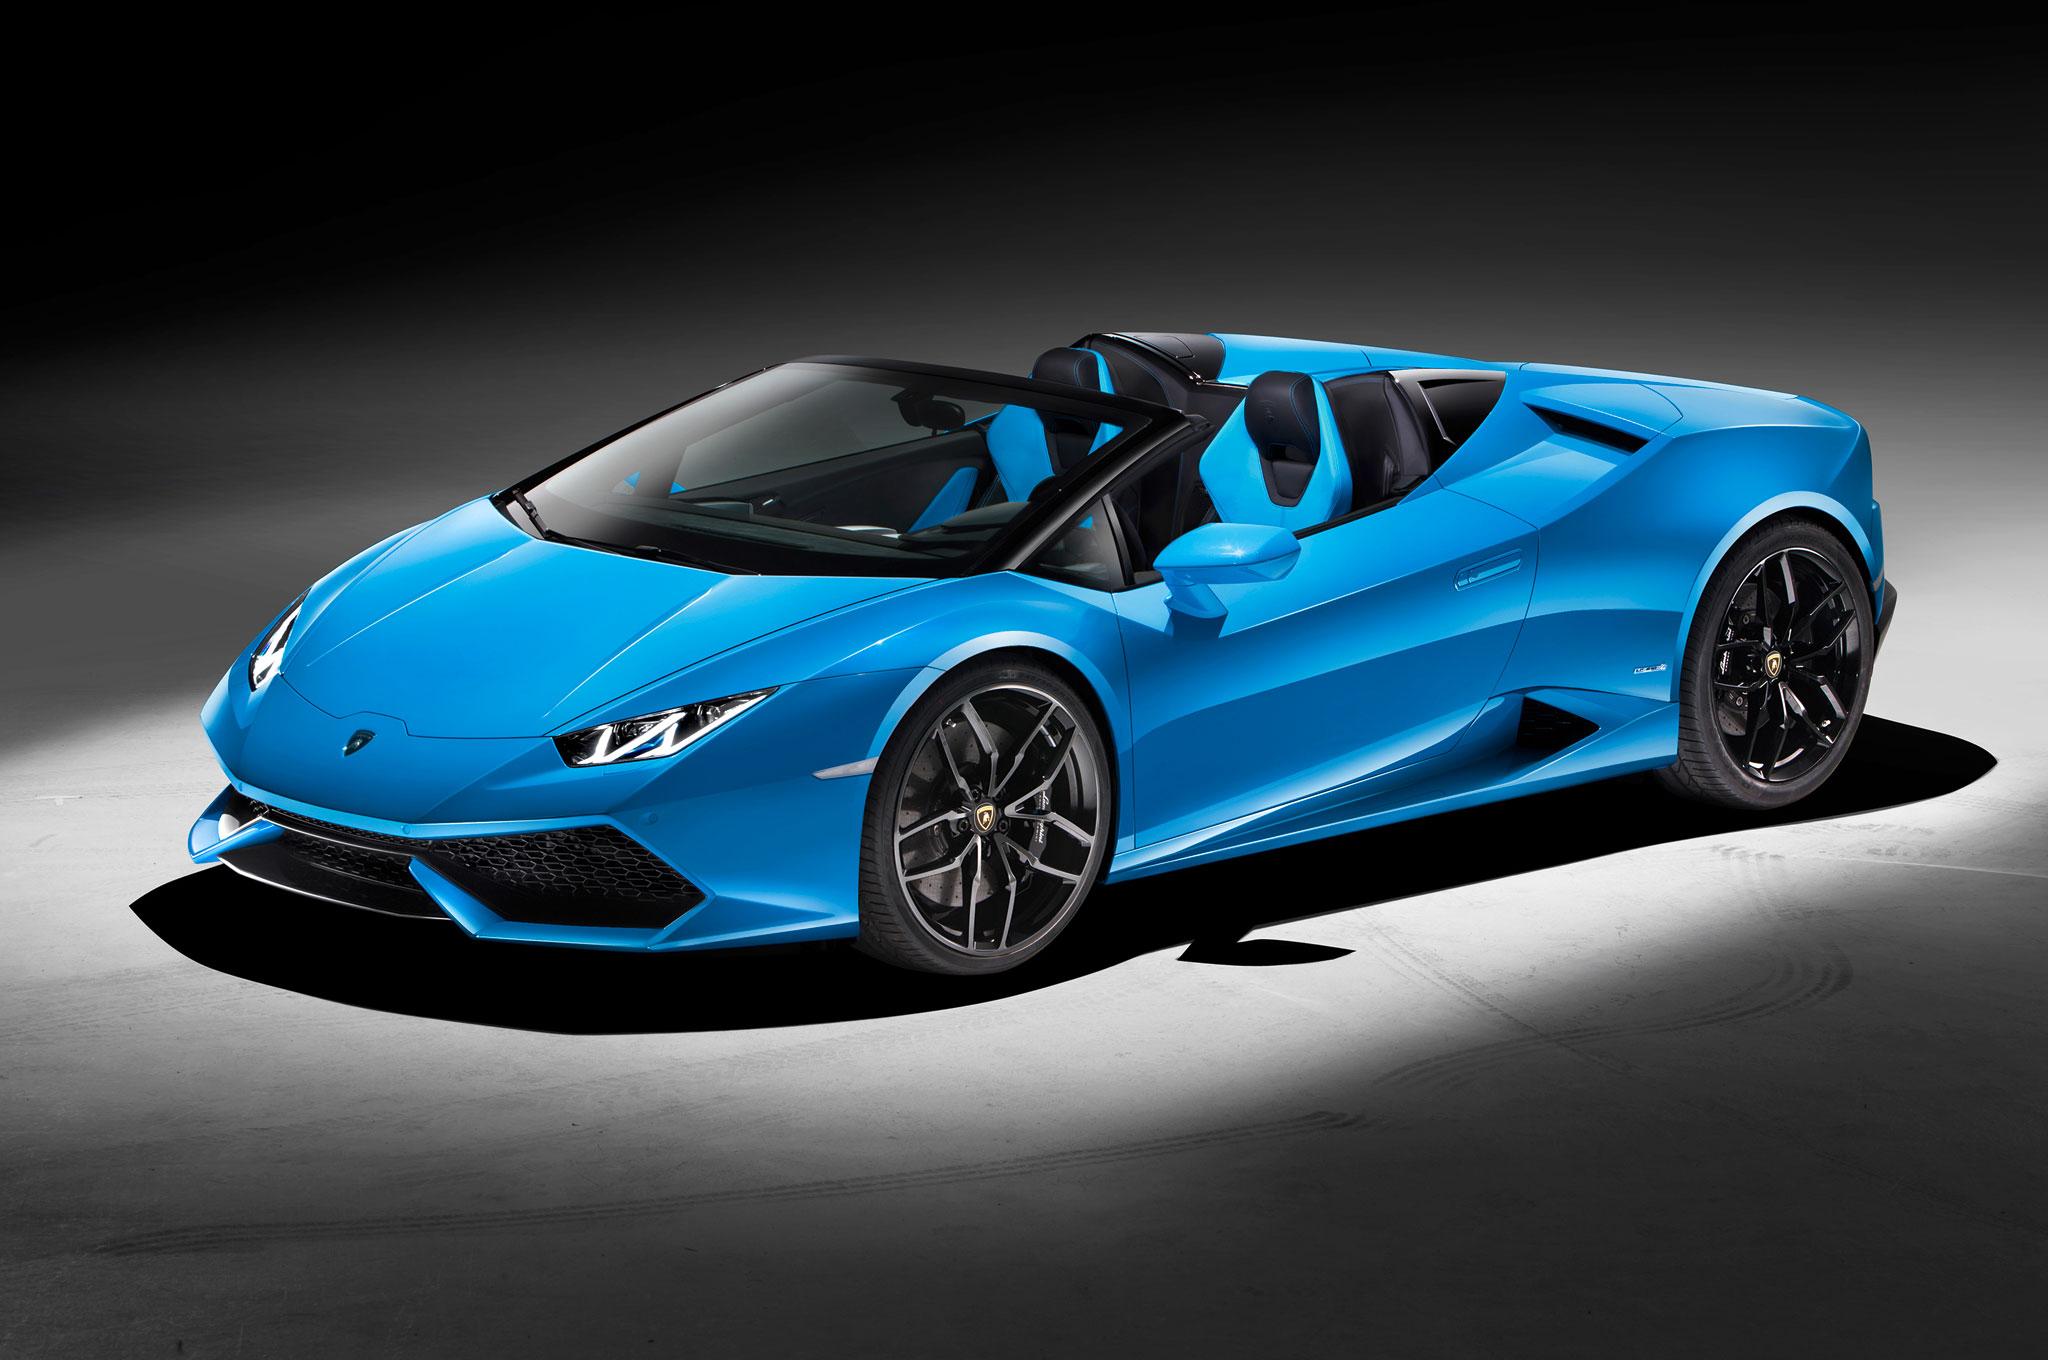 Lamborghini Huracan Spyder Front Side View